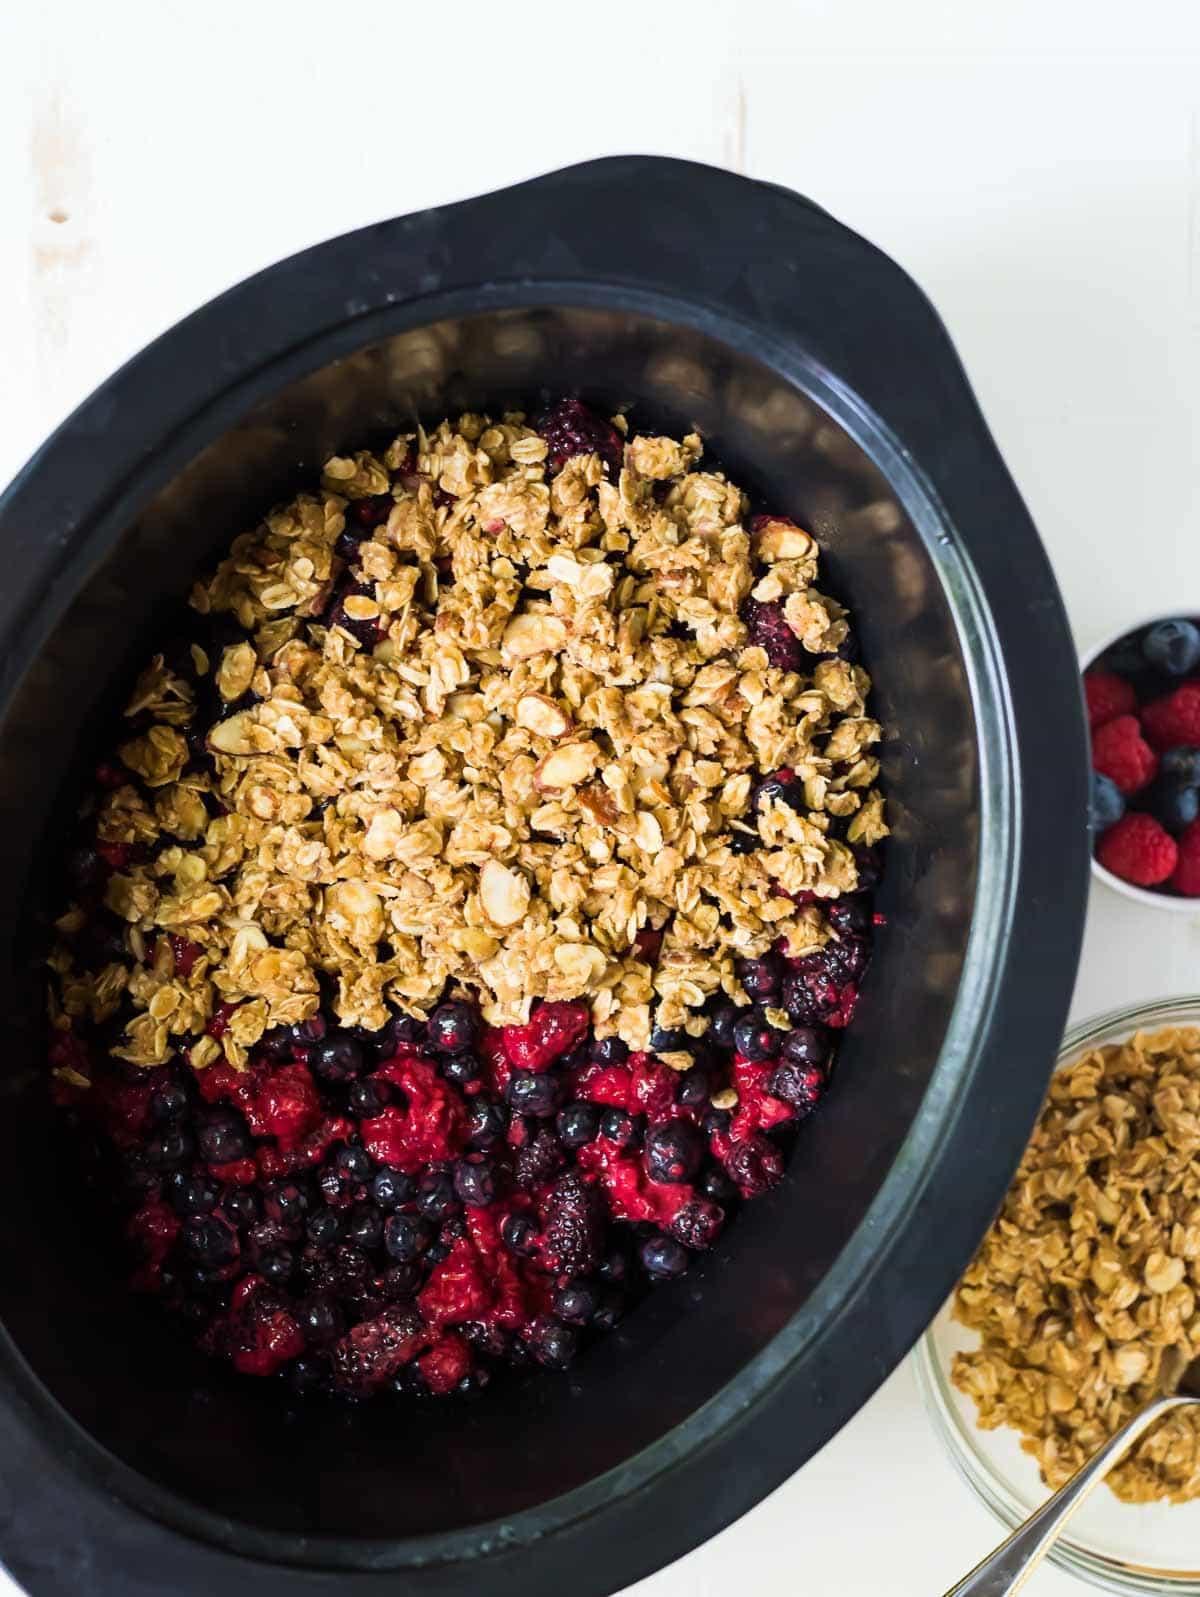 slow cooker full of ingredients to make triple berry crisp